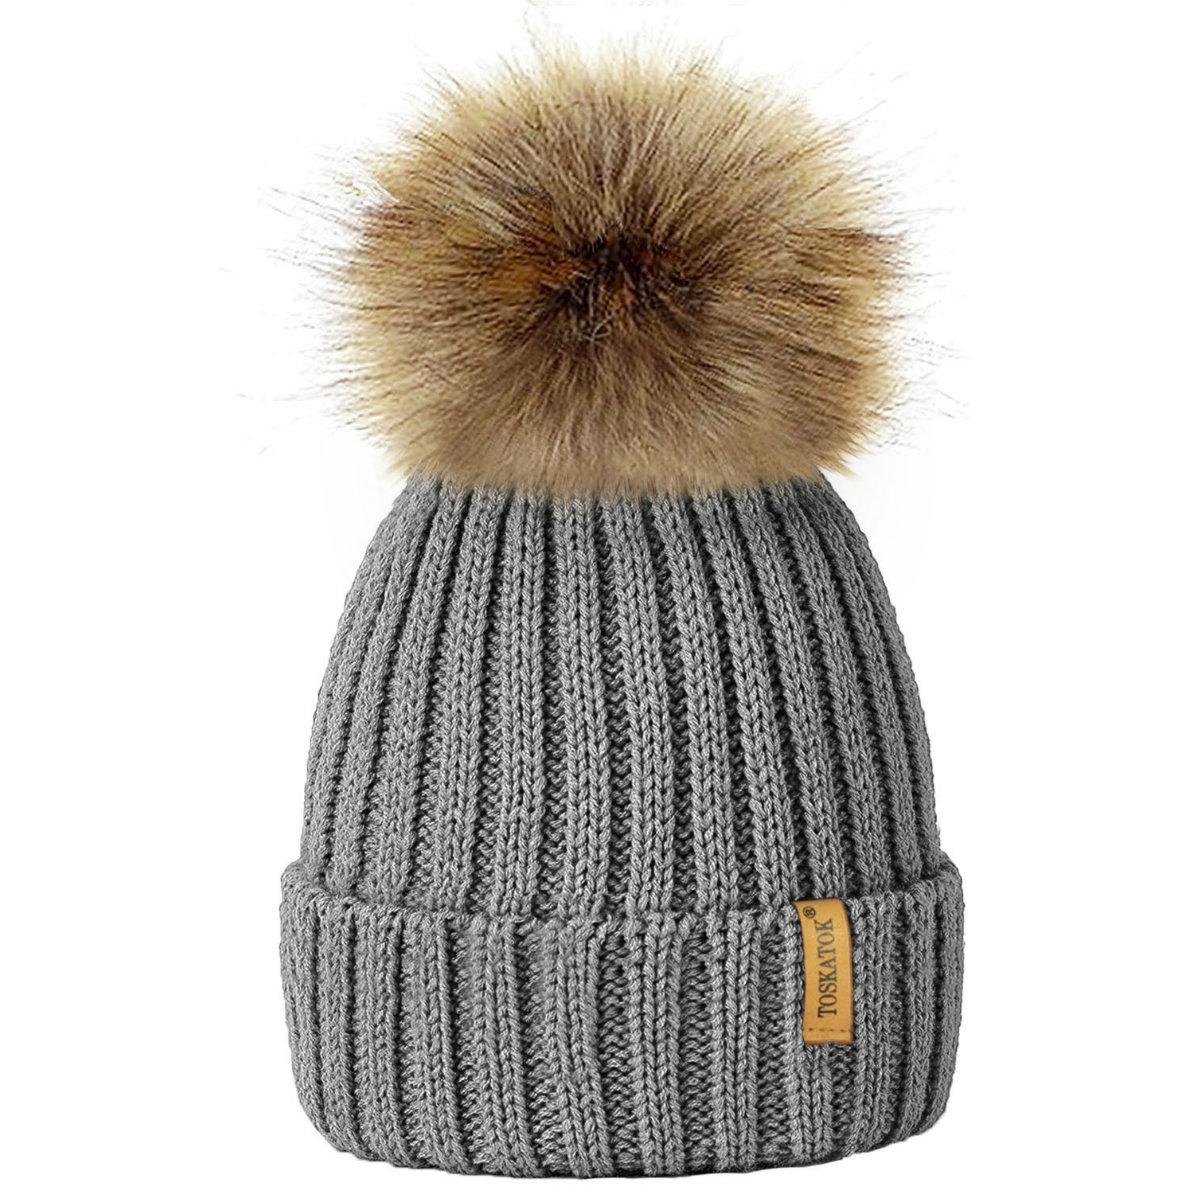 Ribbed Beanie Hat With Faux Fur Pom Pom (Grey) – Muddy-Footprints 392895cd1b8